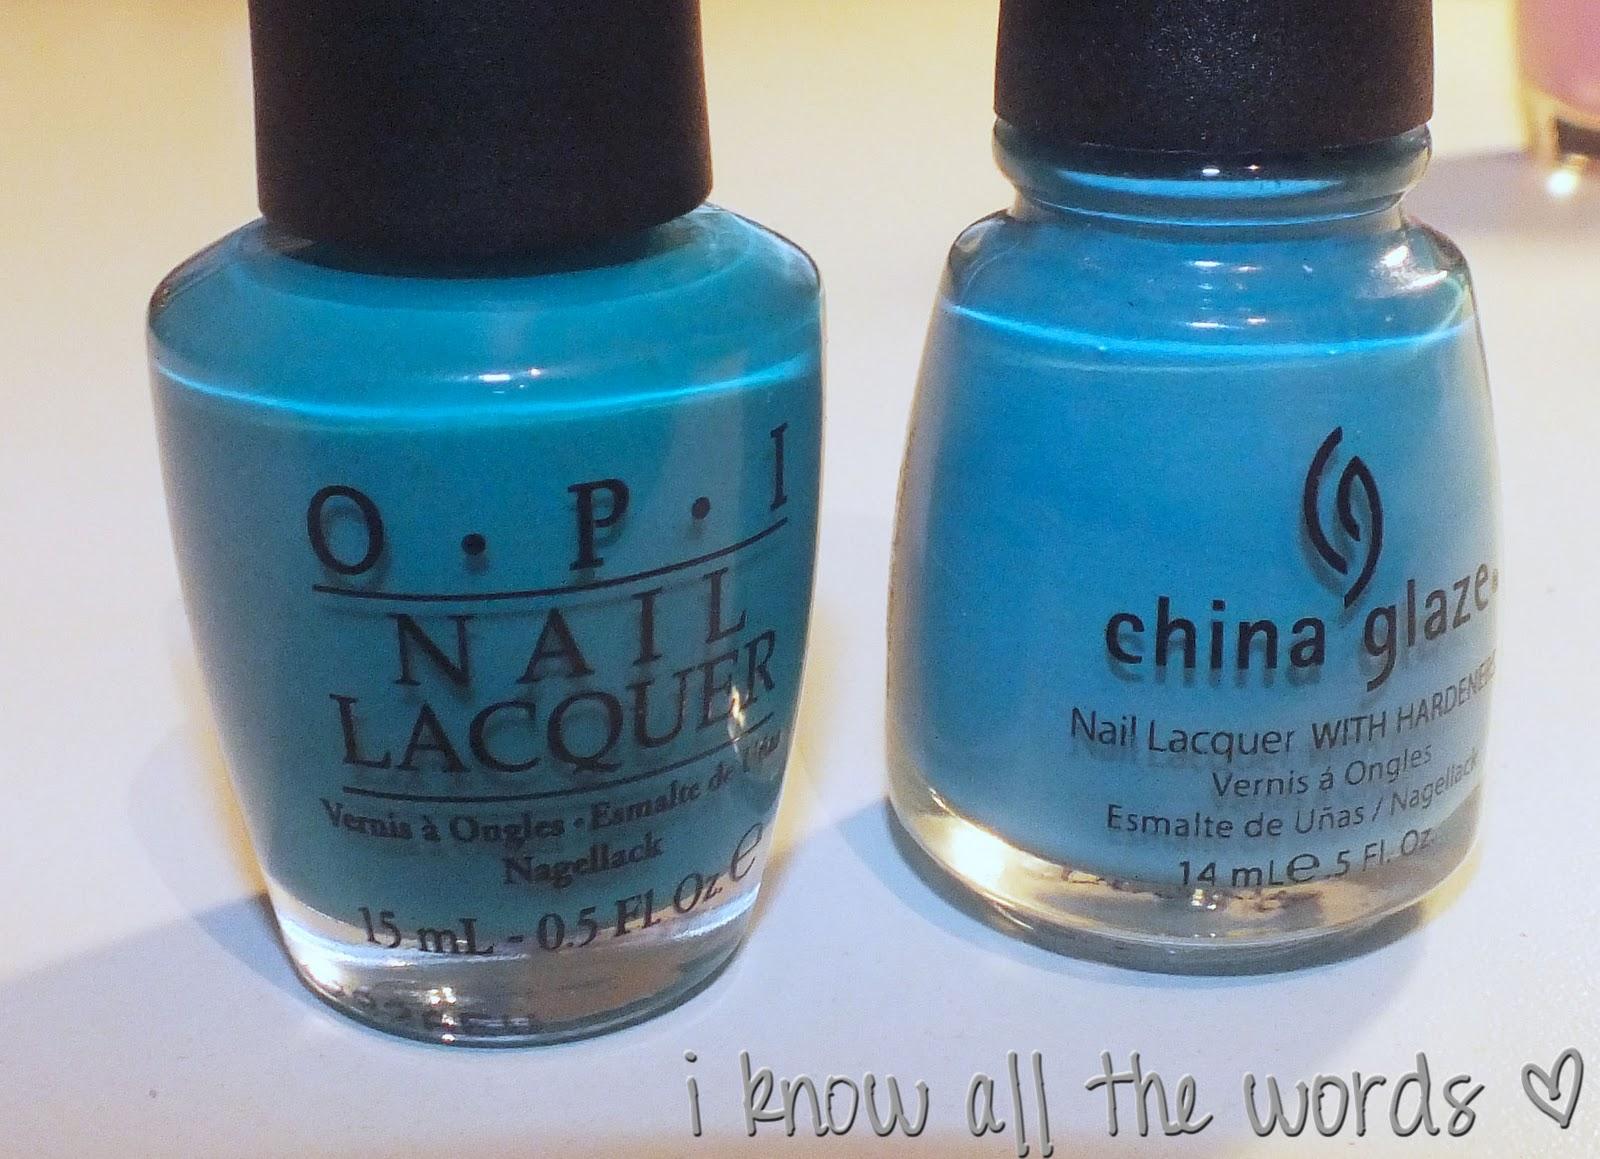 http://3.bp.blogspot.com/-R1xCBmWOwWk/TwKa91oJTPI/AAAAAAAACxs/xi3t7RB42F0/s1600/OPI+Fly+vs+China+Glaze+Flyin+High.JPG